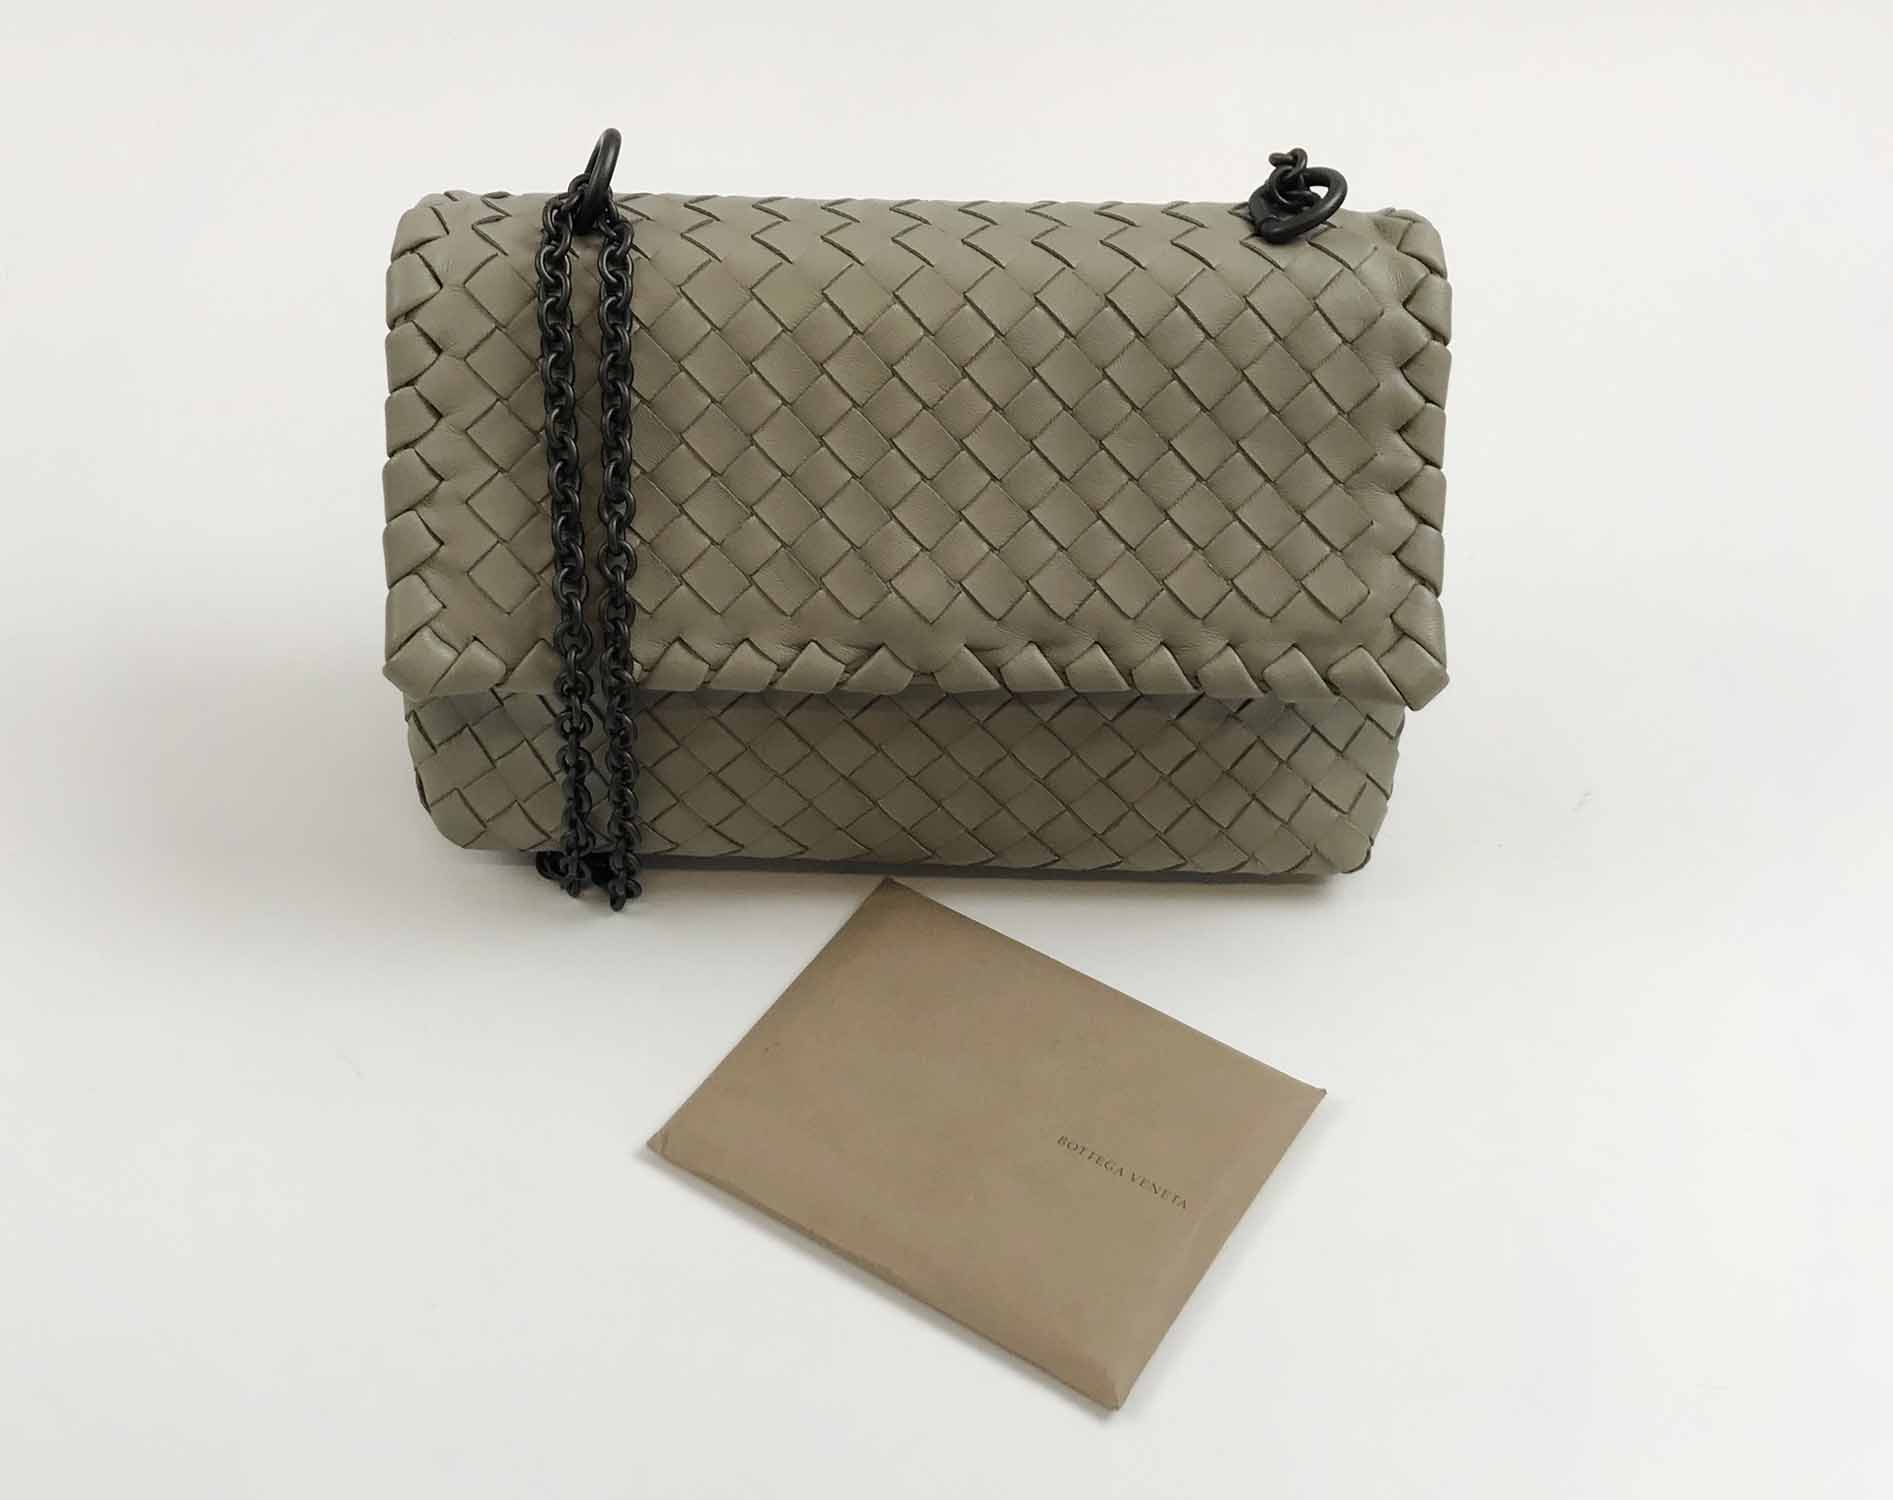 09124f474d BOTTEGA VENETA OLIMPIA CROSSBODY SHOULDER BAG